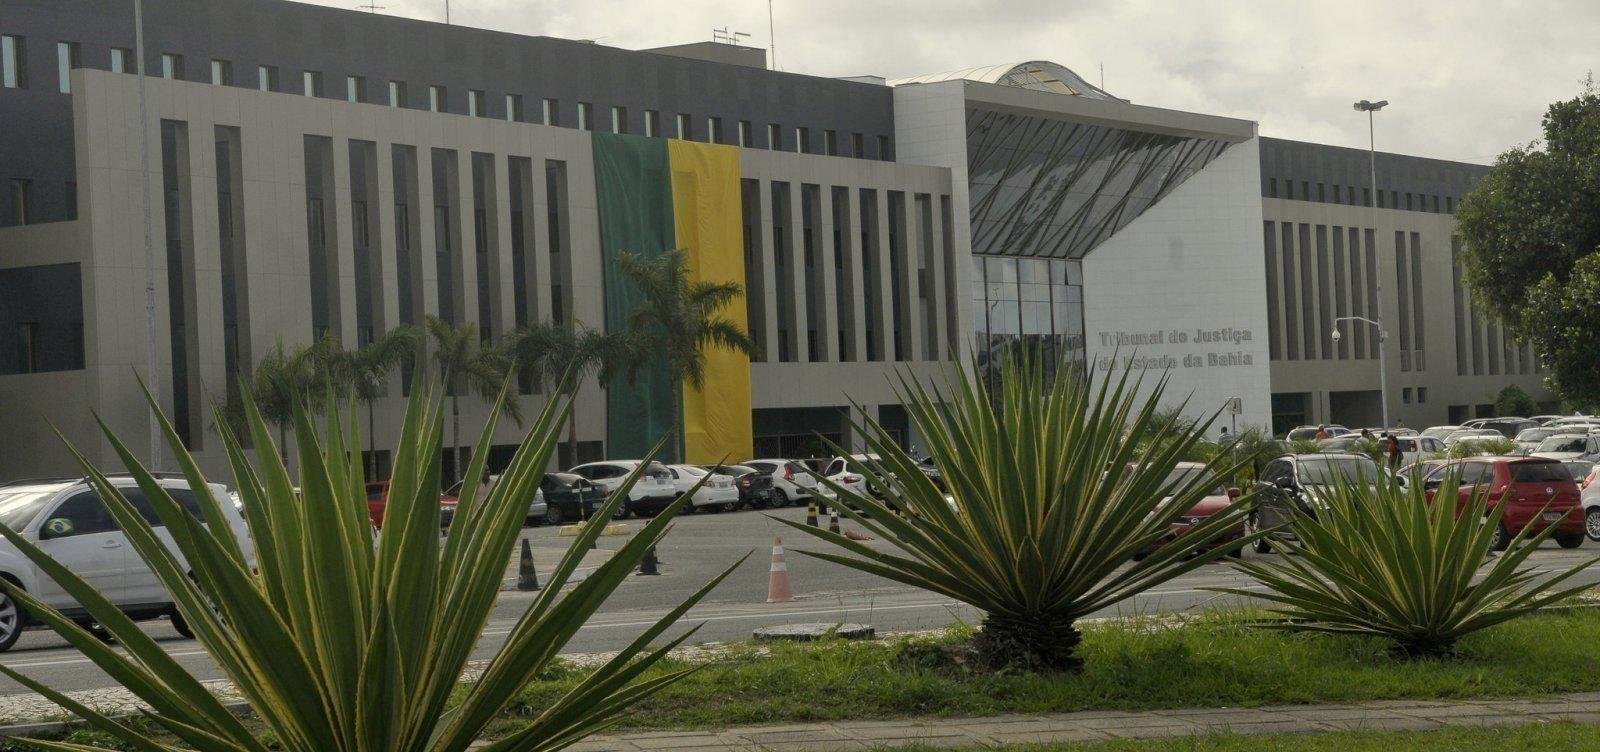 TJ-BA suspende concurso da Assembleia Legislativa da Bahia